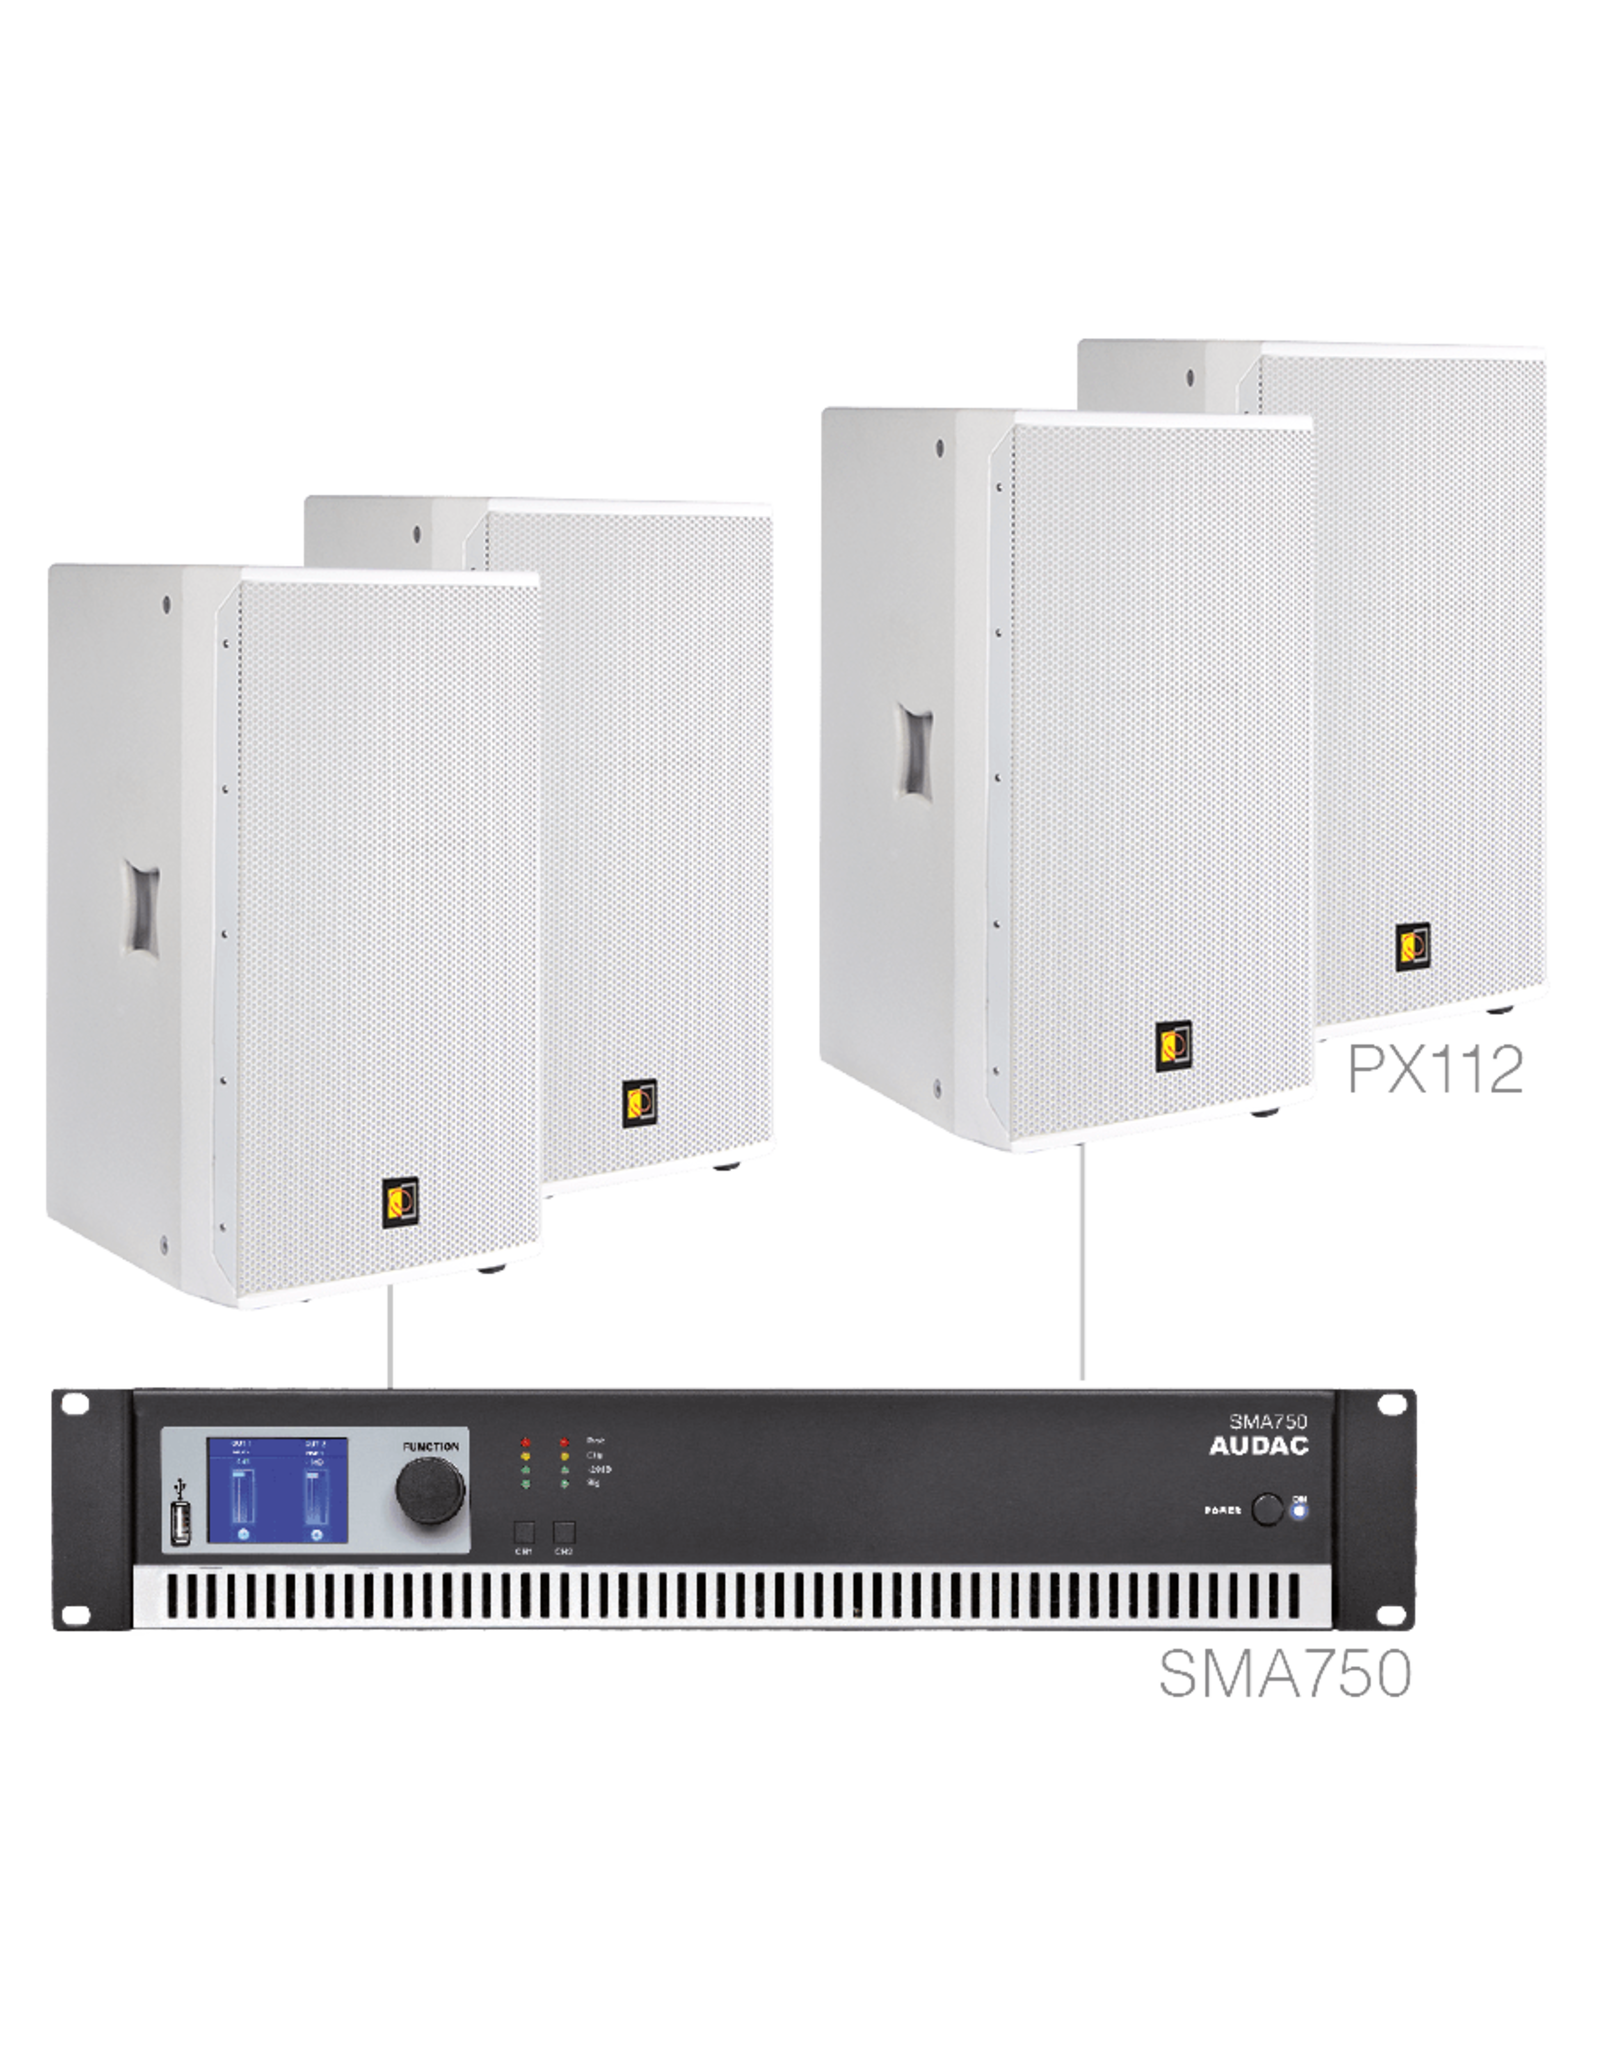 Audac 4 x PX112 + SMA750 White version